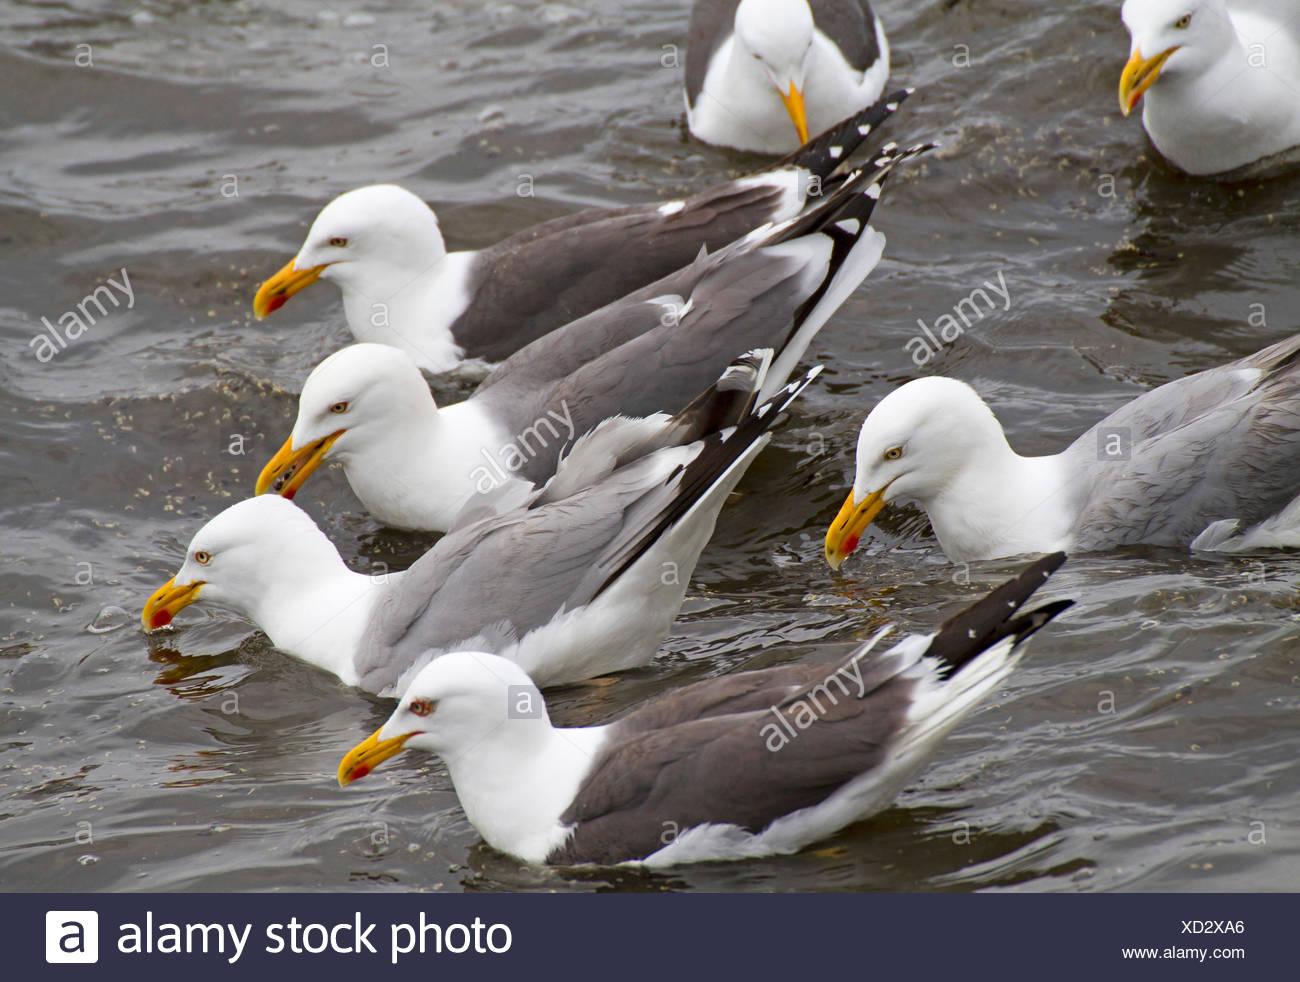 herring gull (Larus argentatus), herring gulls and lesser black-backed gulls swimming together, Europe, Germany, Schleswig-Holstein, Heligoland - Stock Image